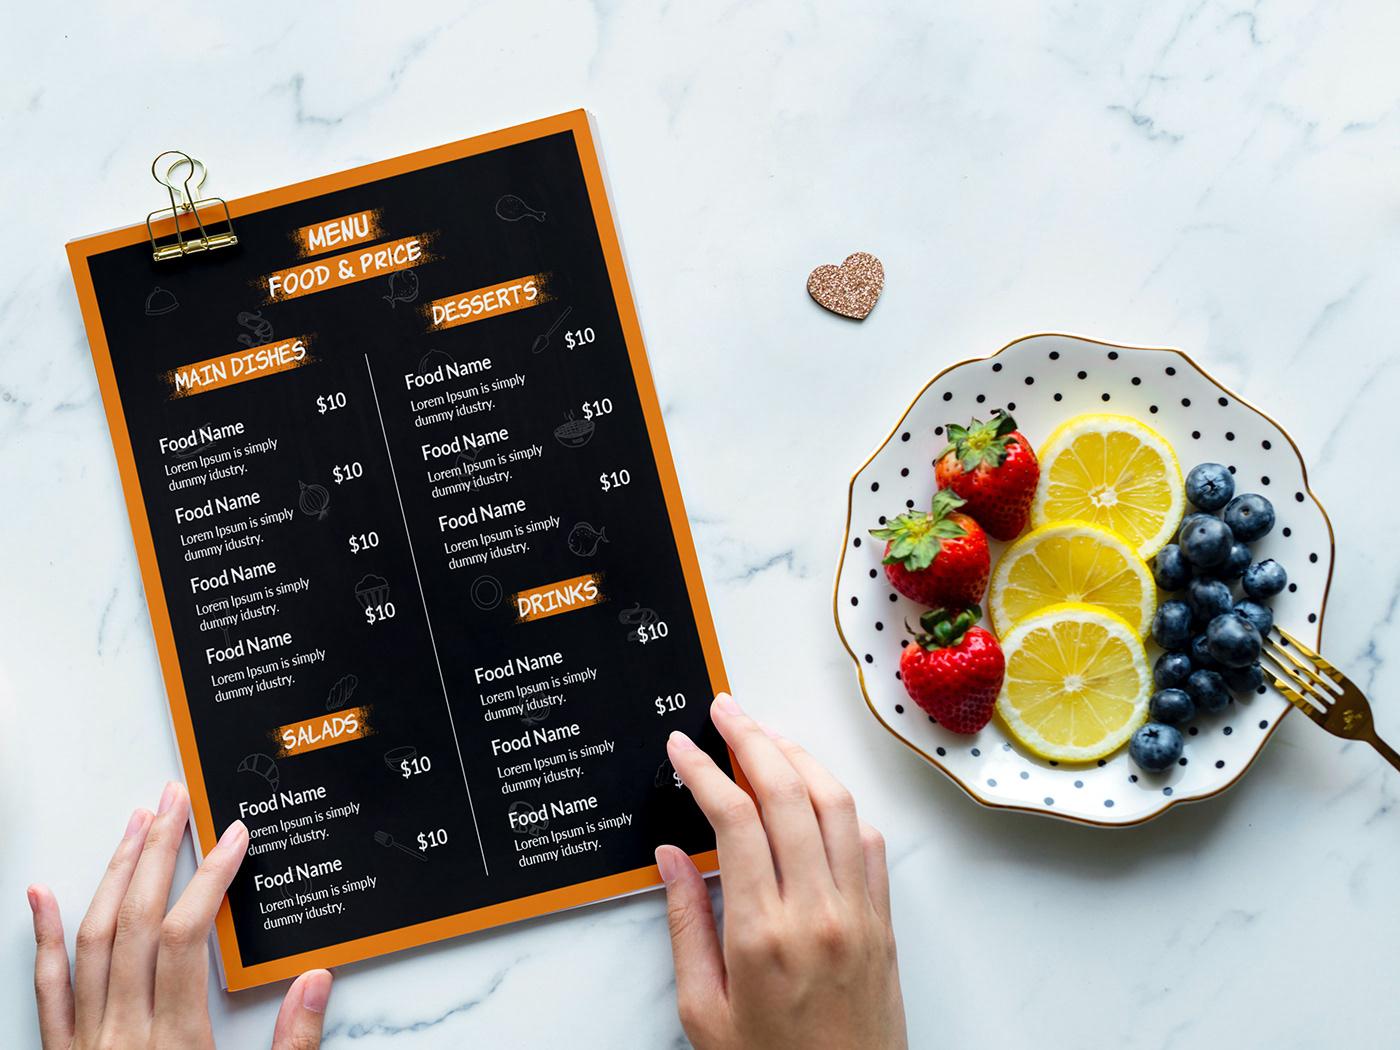 Image may contain: food, menu and fast food